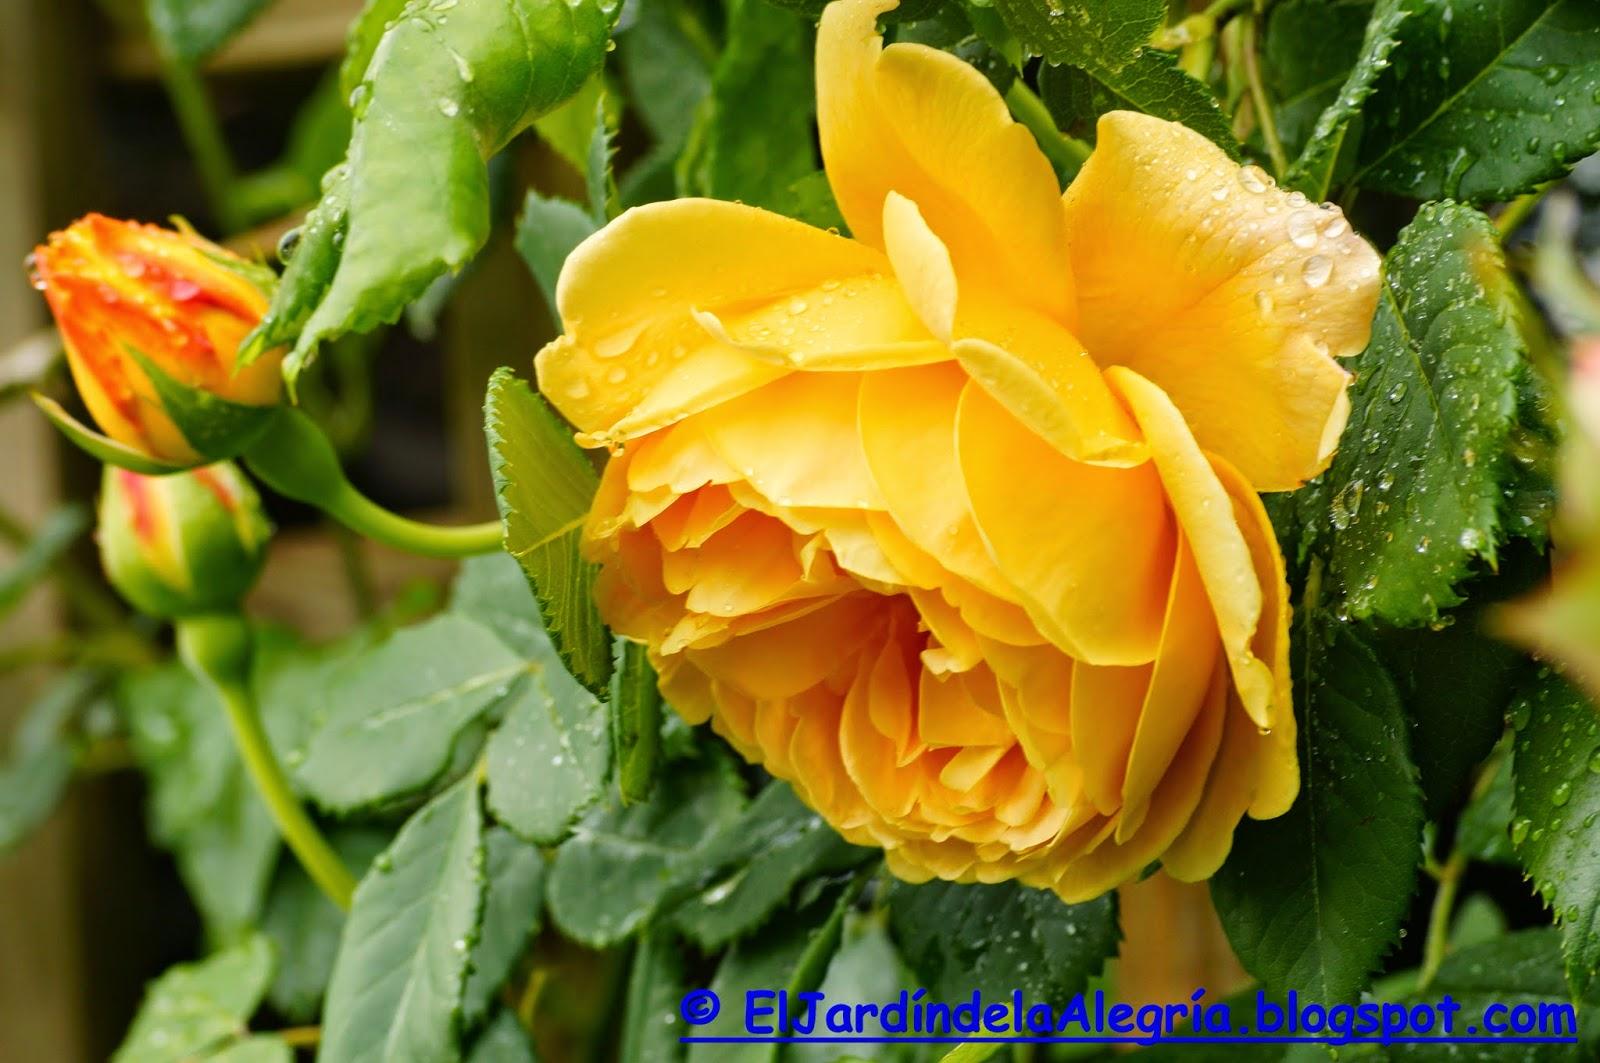 El jard n de la alegr a 07 03 14 for Cancion el jardin de la alegria